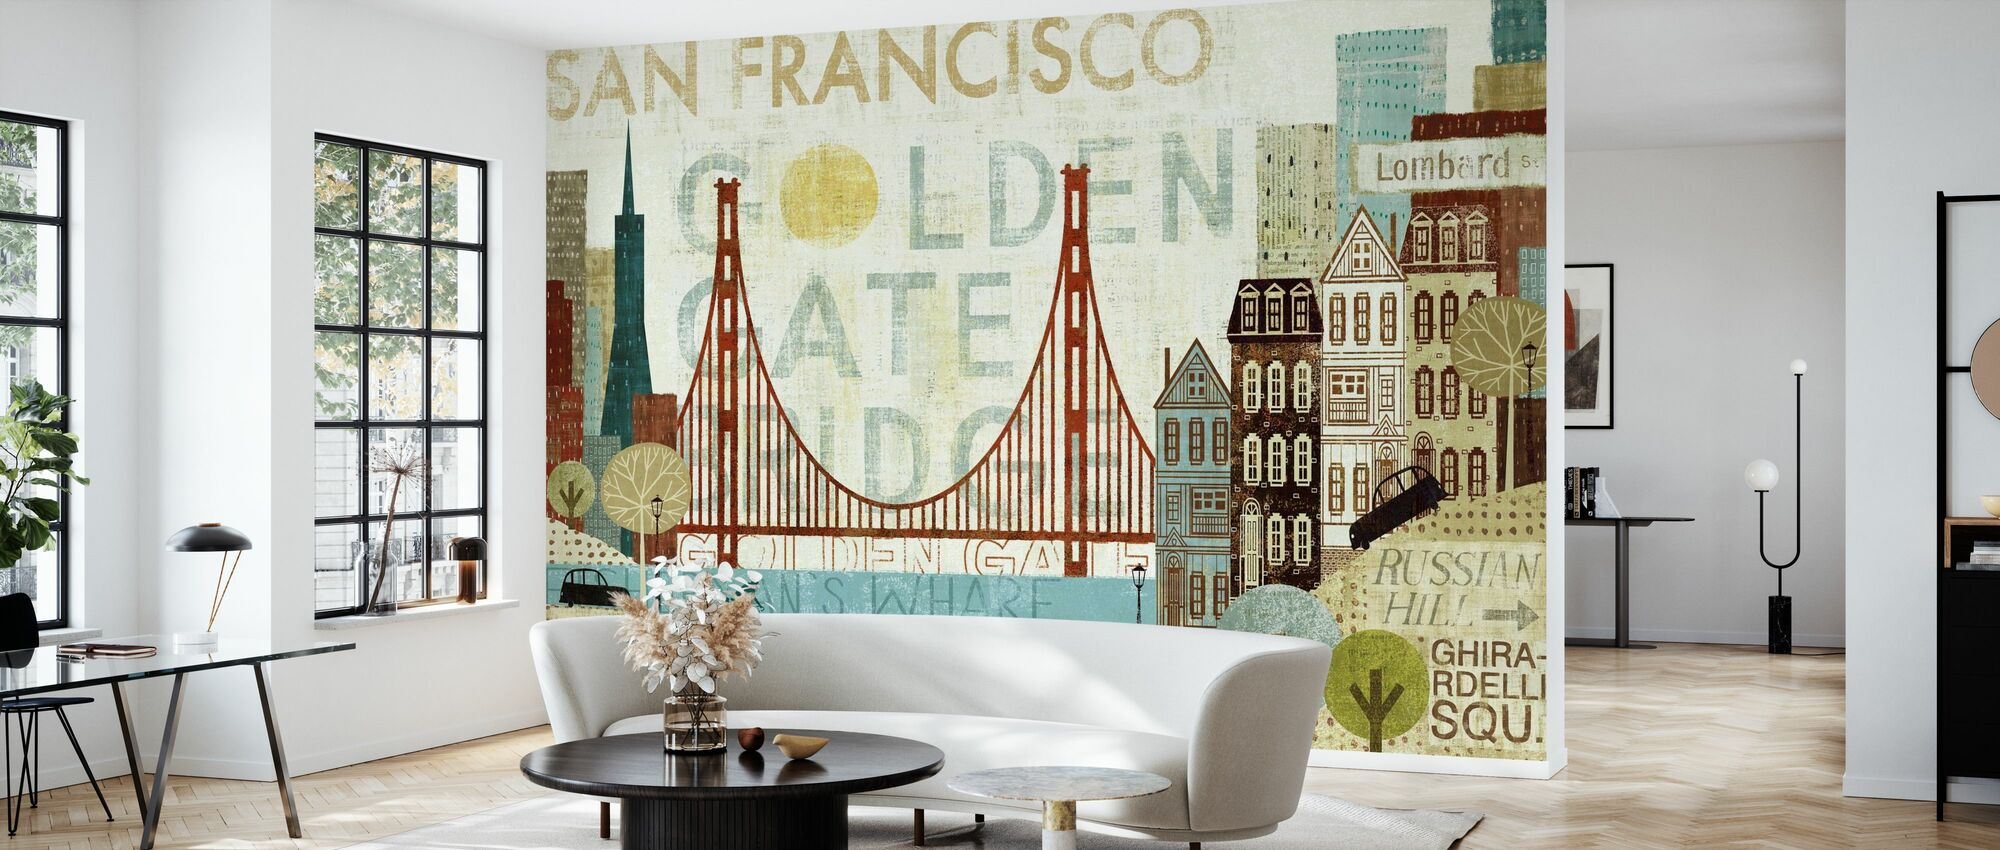 Hey San Francisco - Wallpaper - Living Room